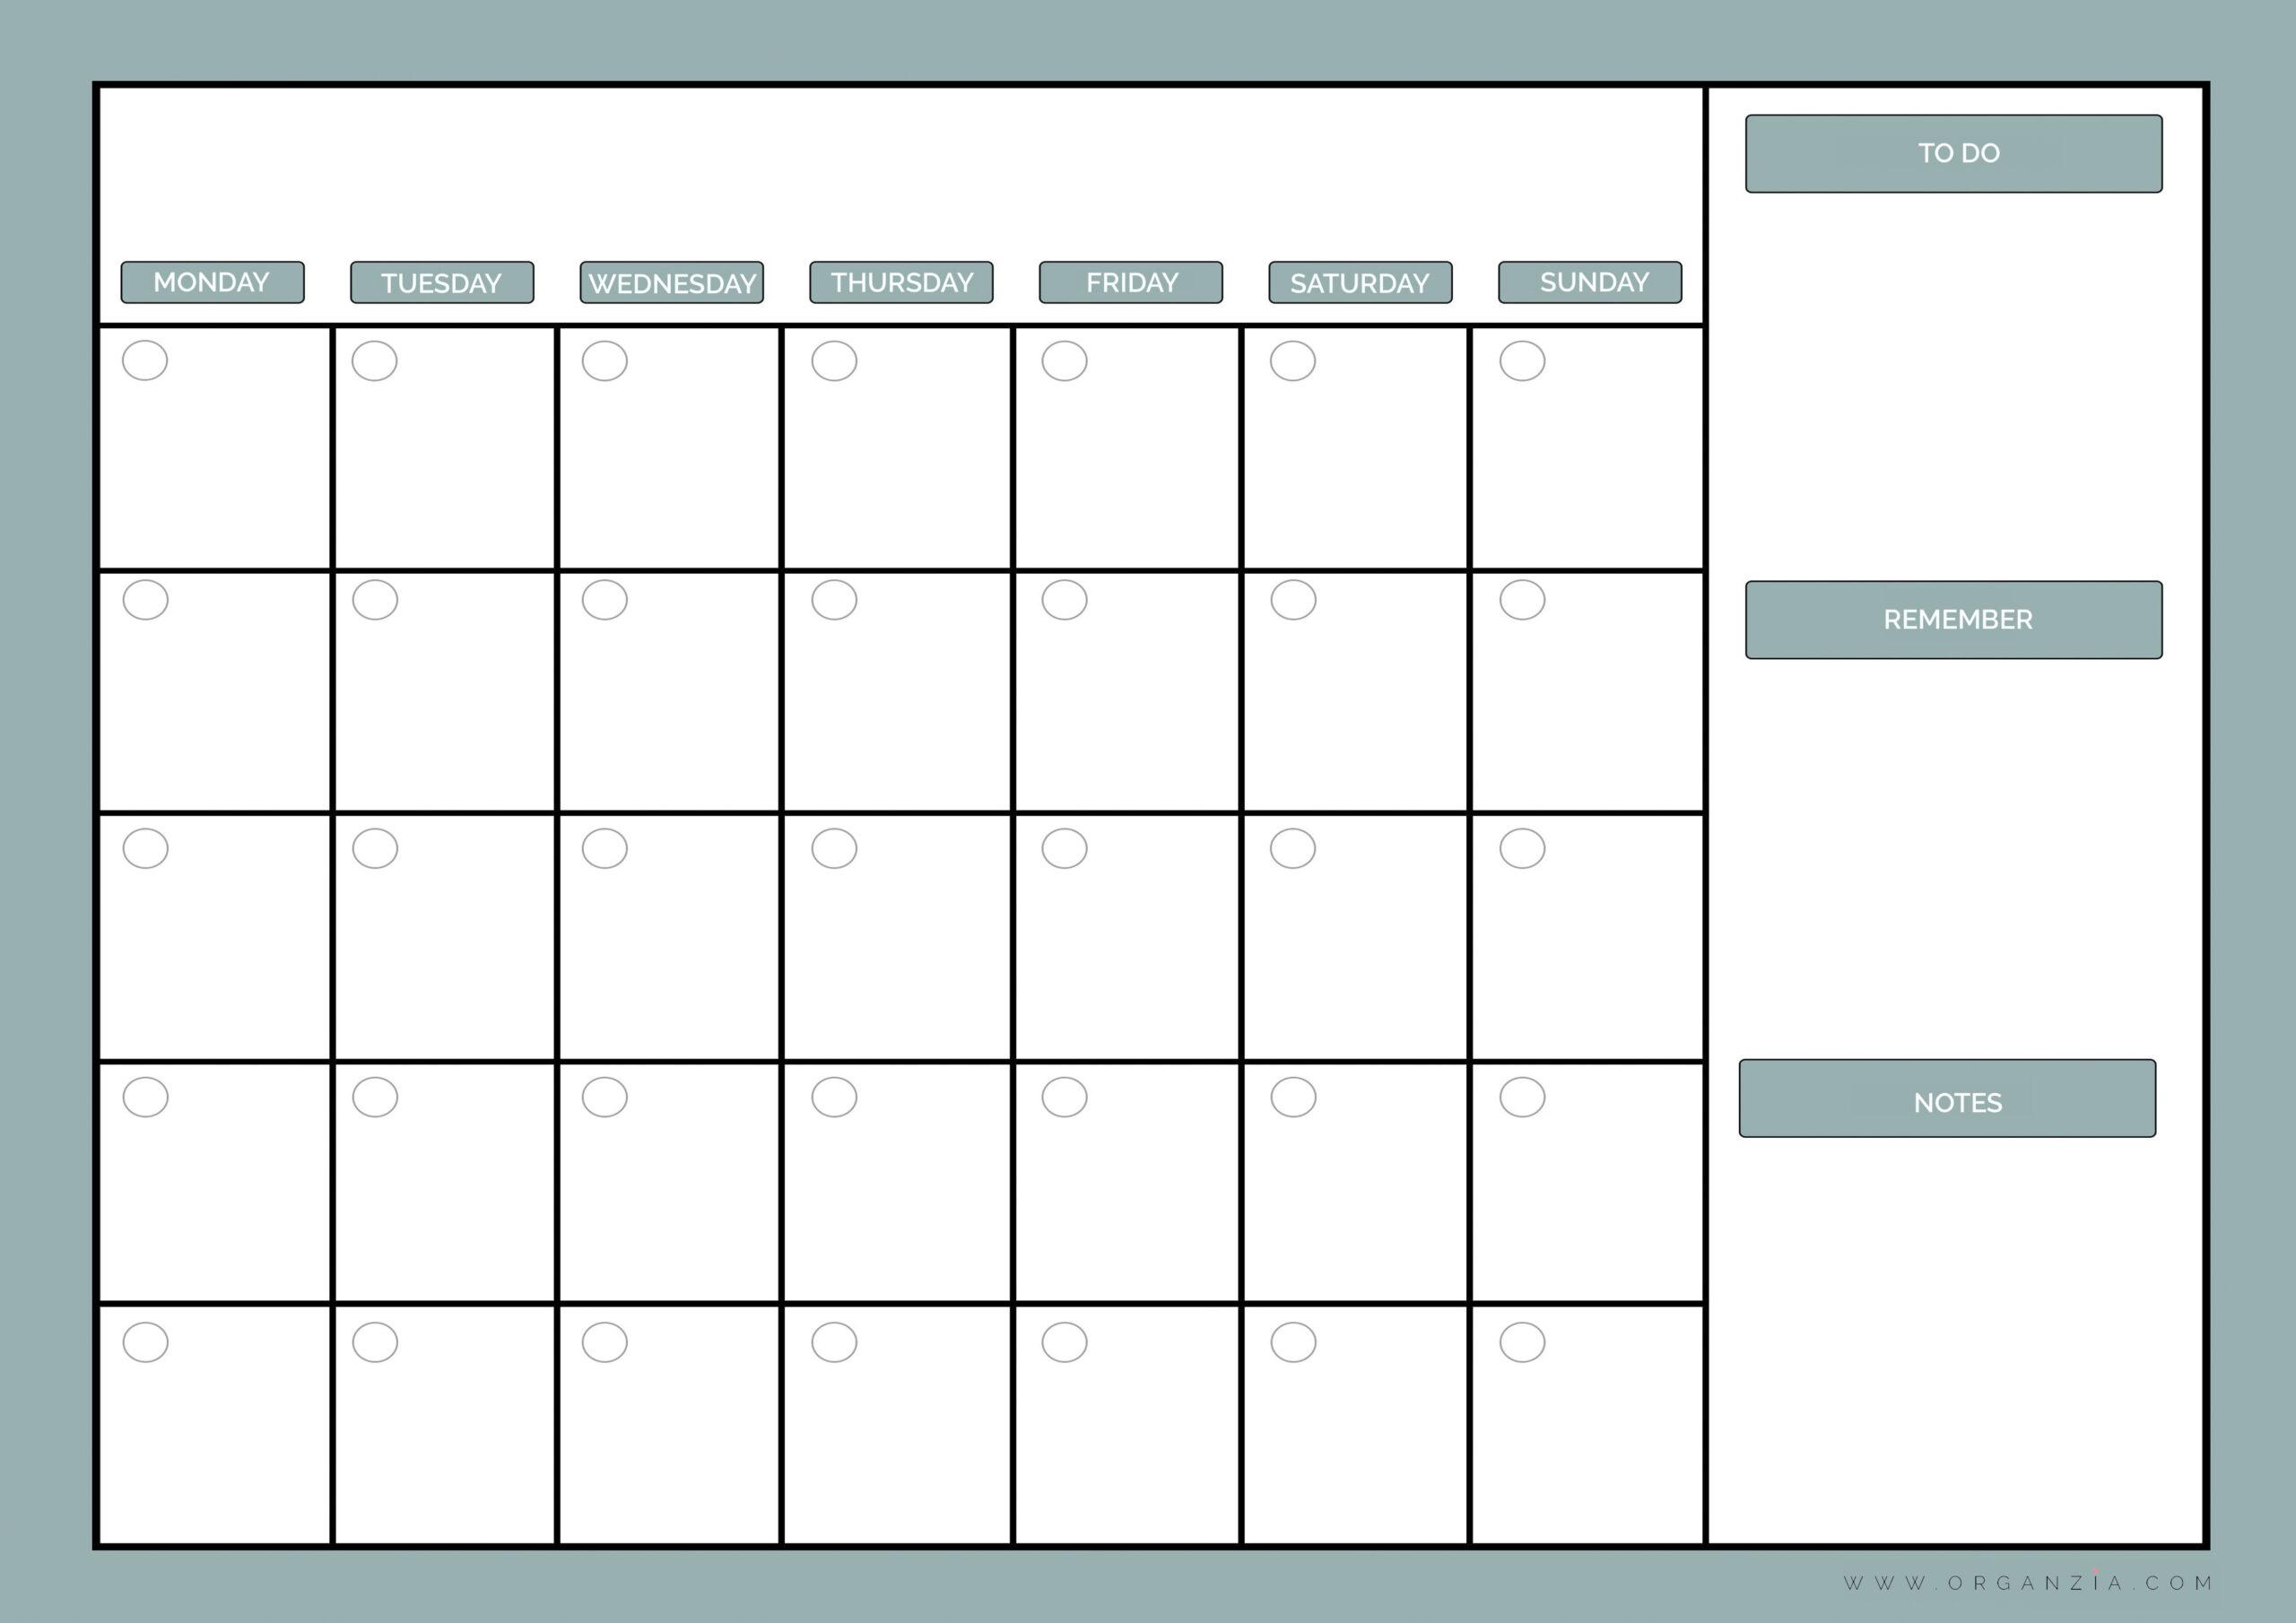 Diy Monthly Planner, Dry Erase Calendar + Free Printable in Printable Monthly Calendar Without Download